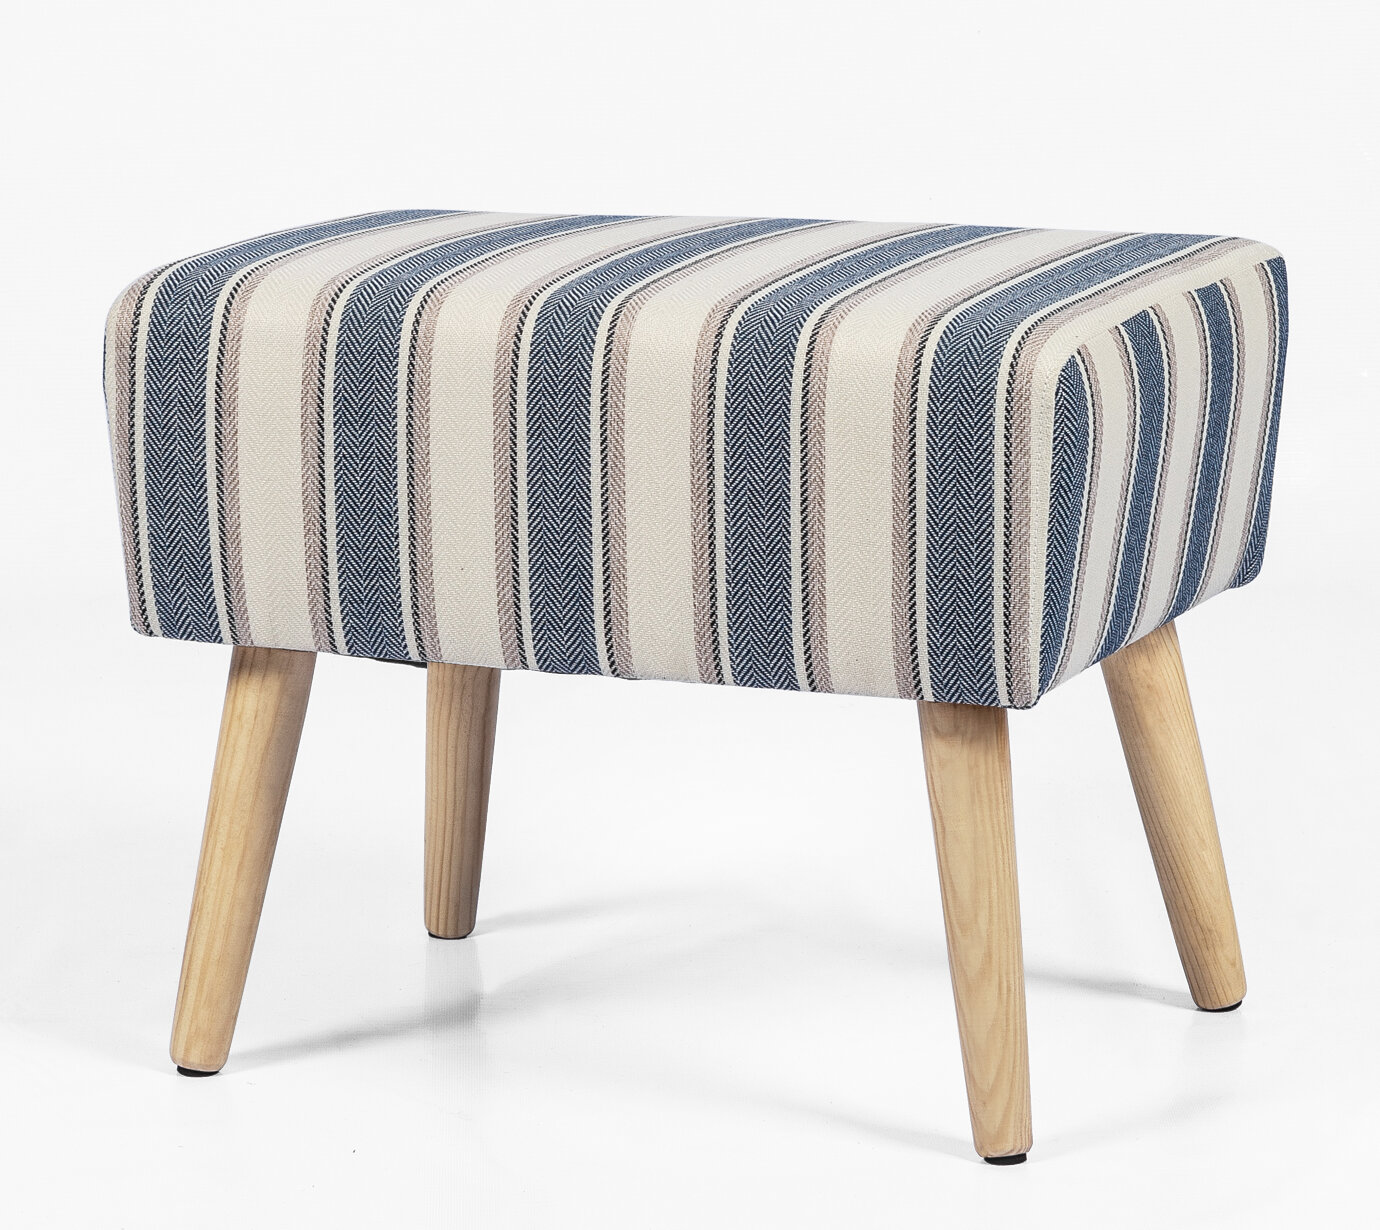 Stupendous Del Rey Oaks Simple Stripes Vanity Stool Camellatalisay Diy Chair Ideas Camellatalisaycom